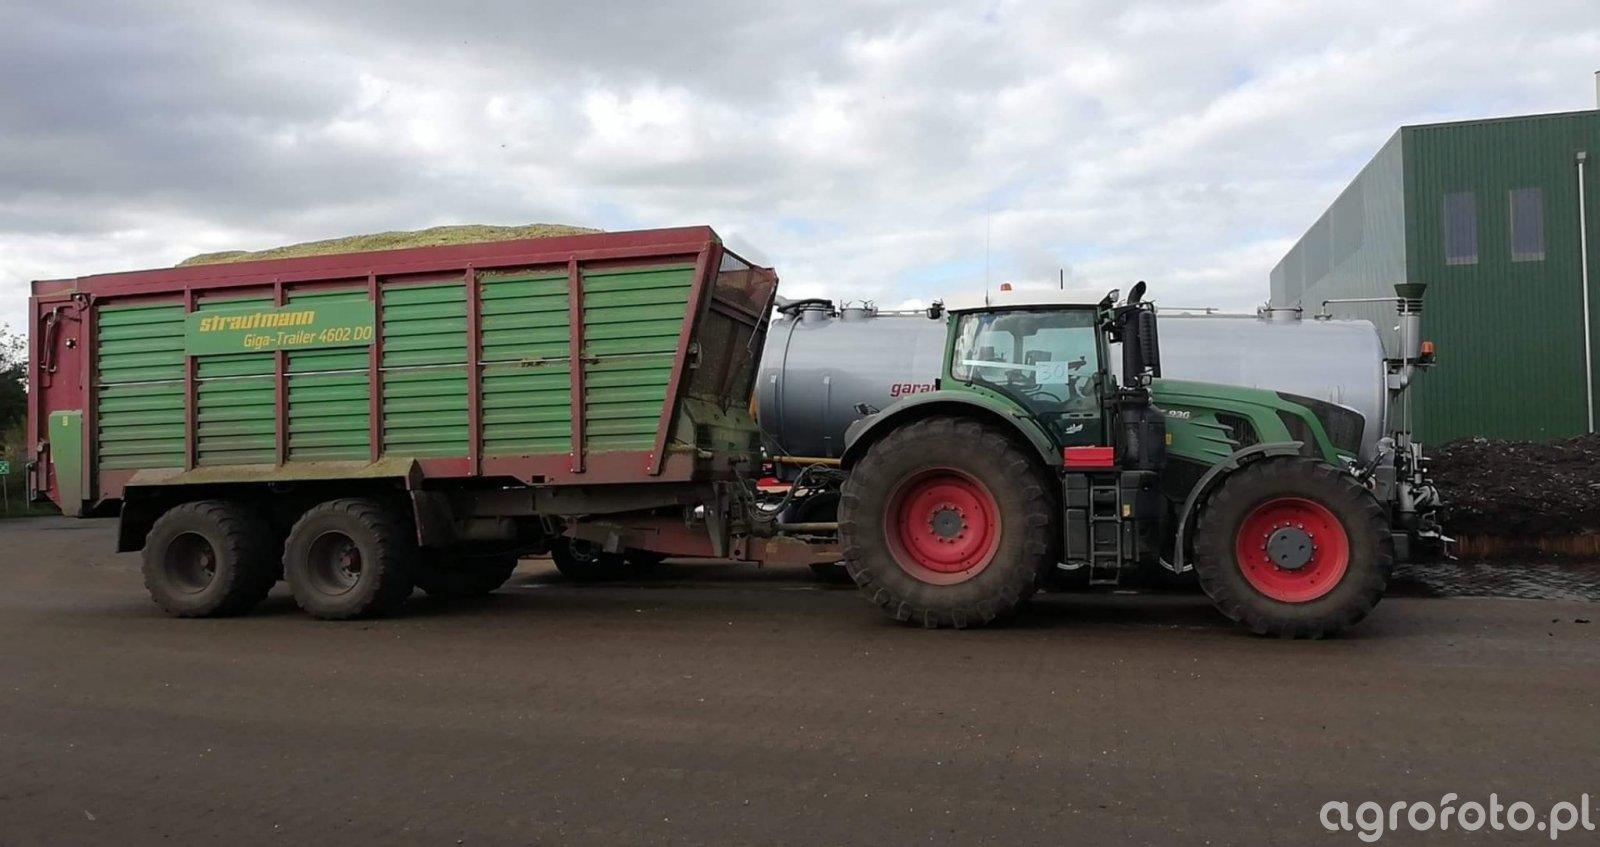 Fendt 930 + Strautmann Giga trailer 4602